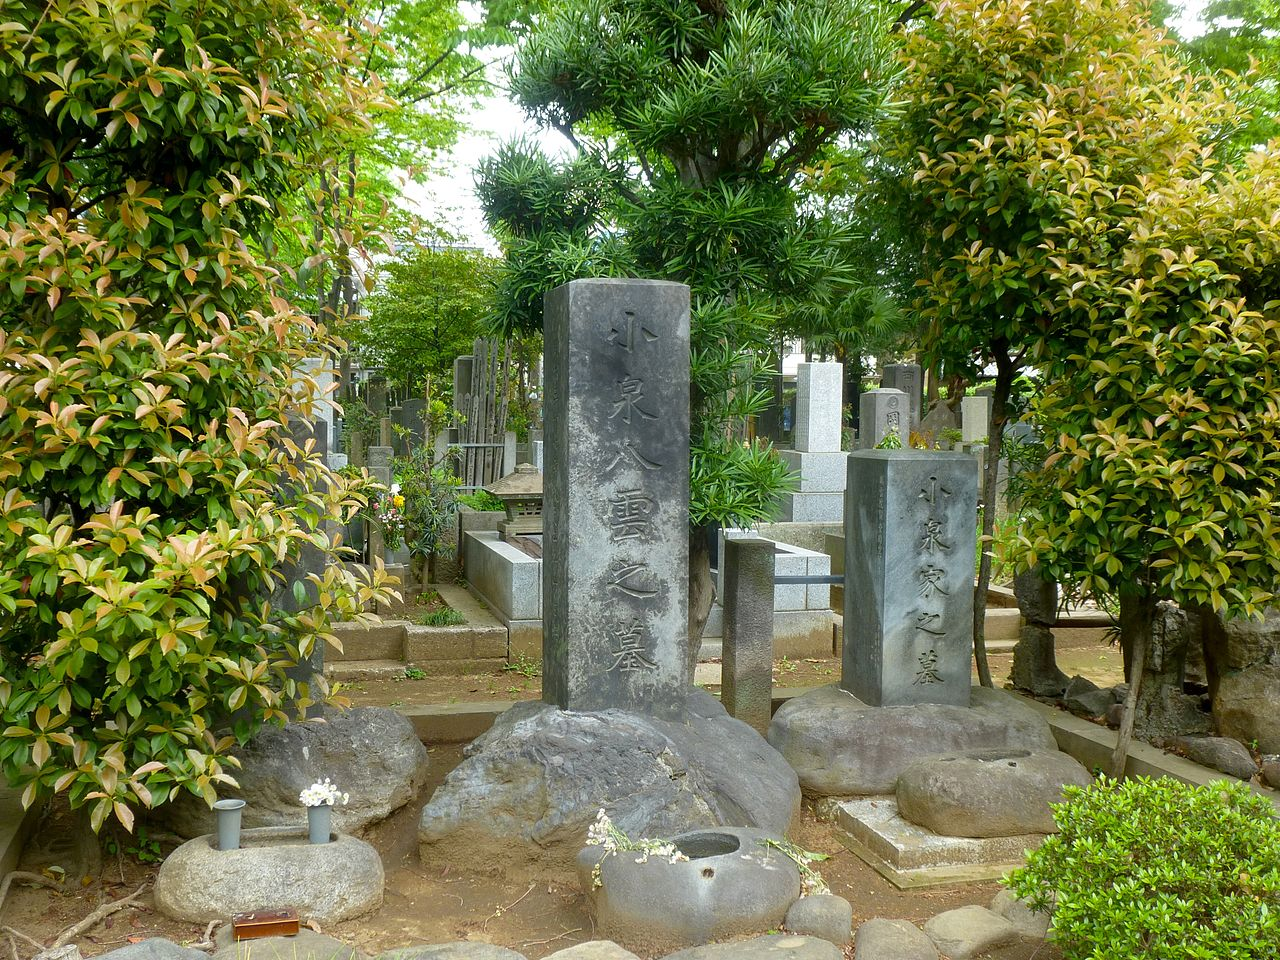 https://upload.wikimedia.org/wikipedia/commons/thumb/d/d5/Patrick_Lafcadio_Hearn_aka_Koizumi_Yakumo_-_grave_2013.jpg/1280px-Patrick_Lafcadio_Hearn_aka_Koizumi_Yakumo_-_grave_2013.jpg